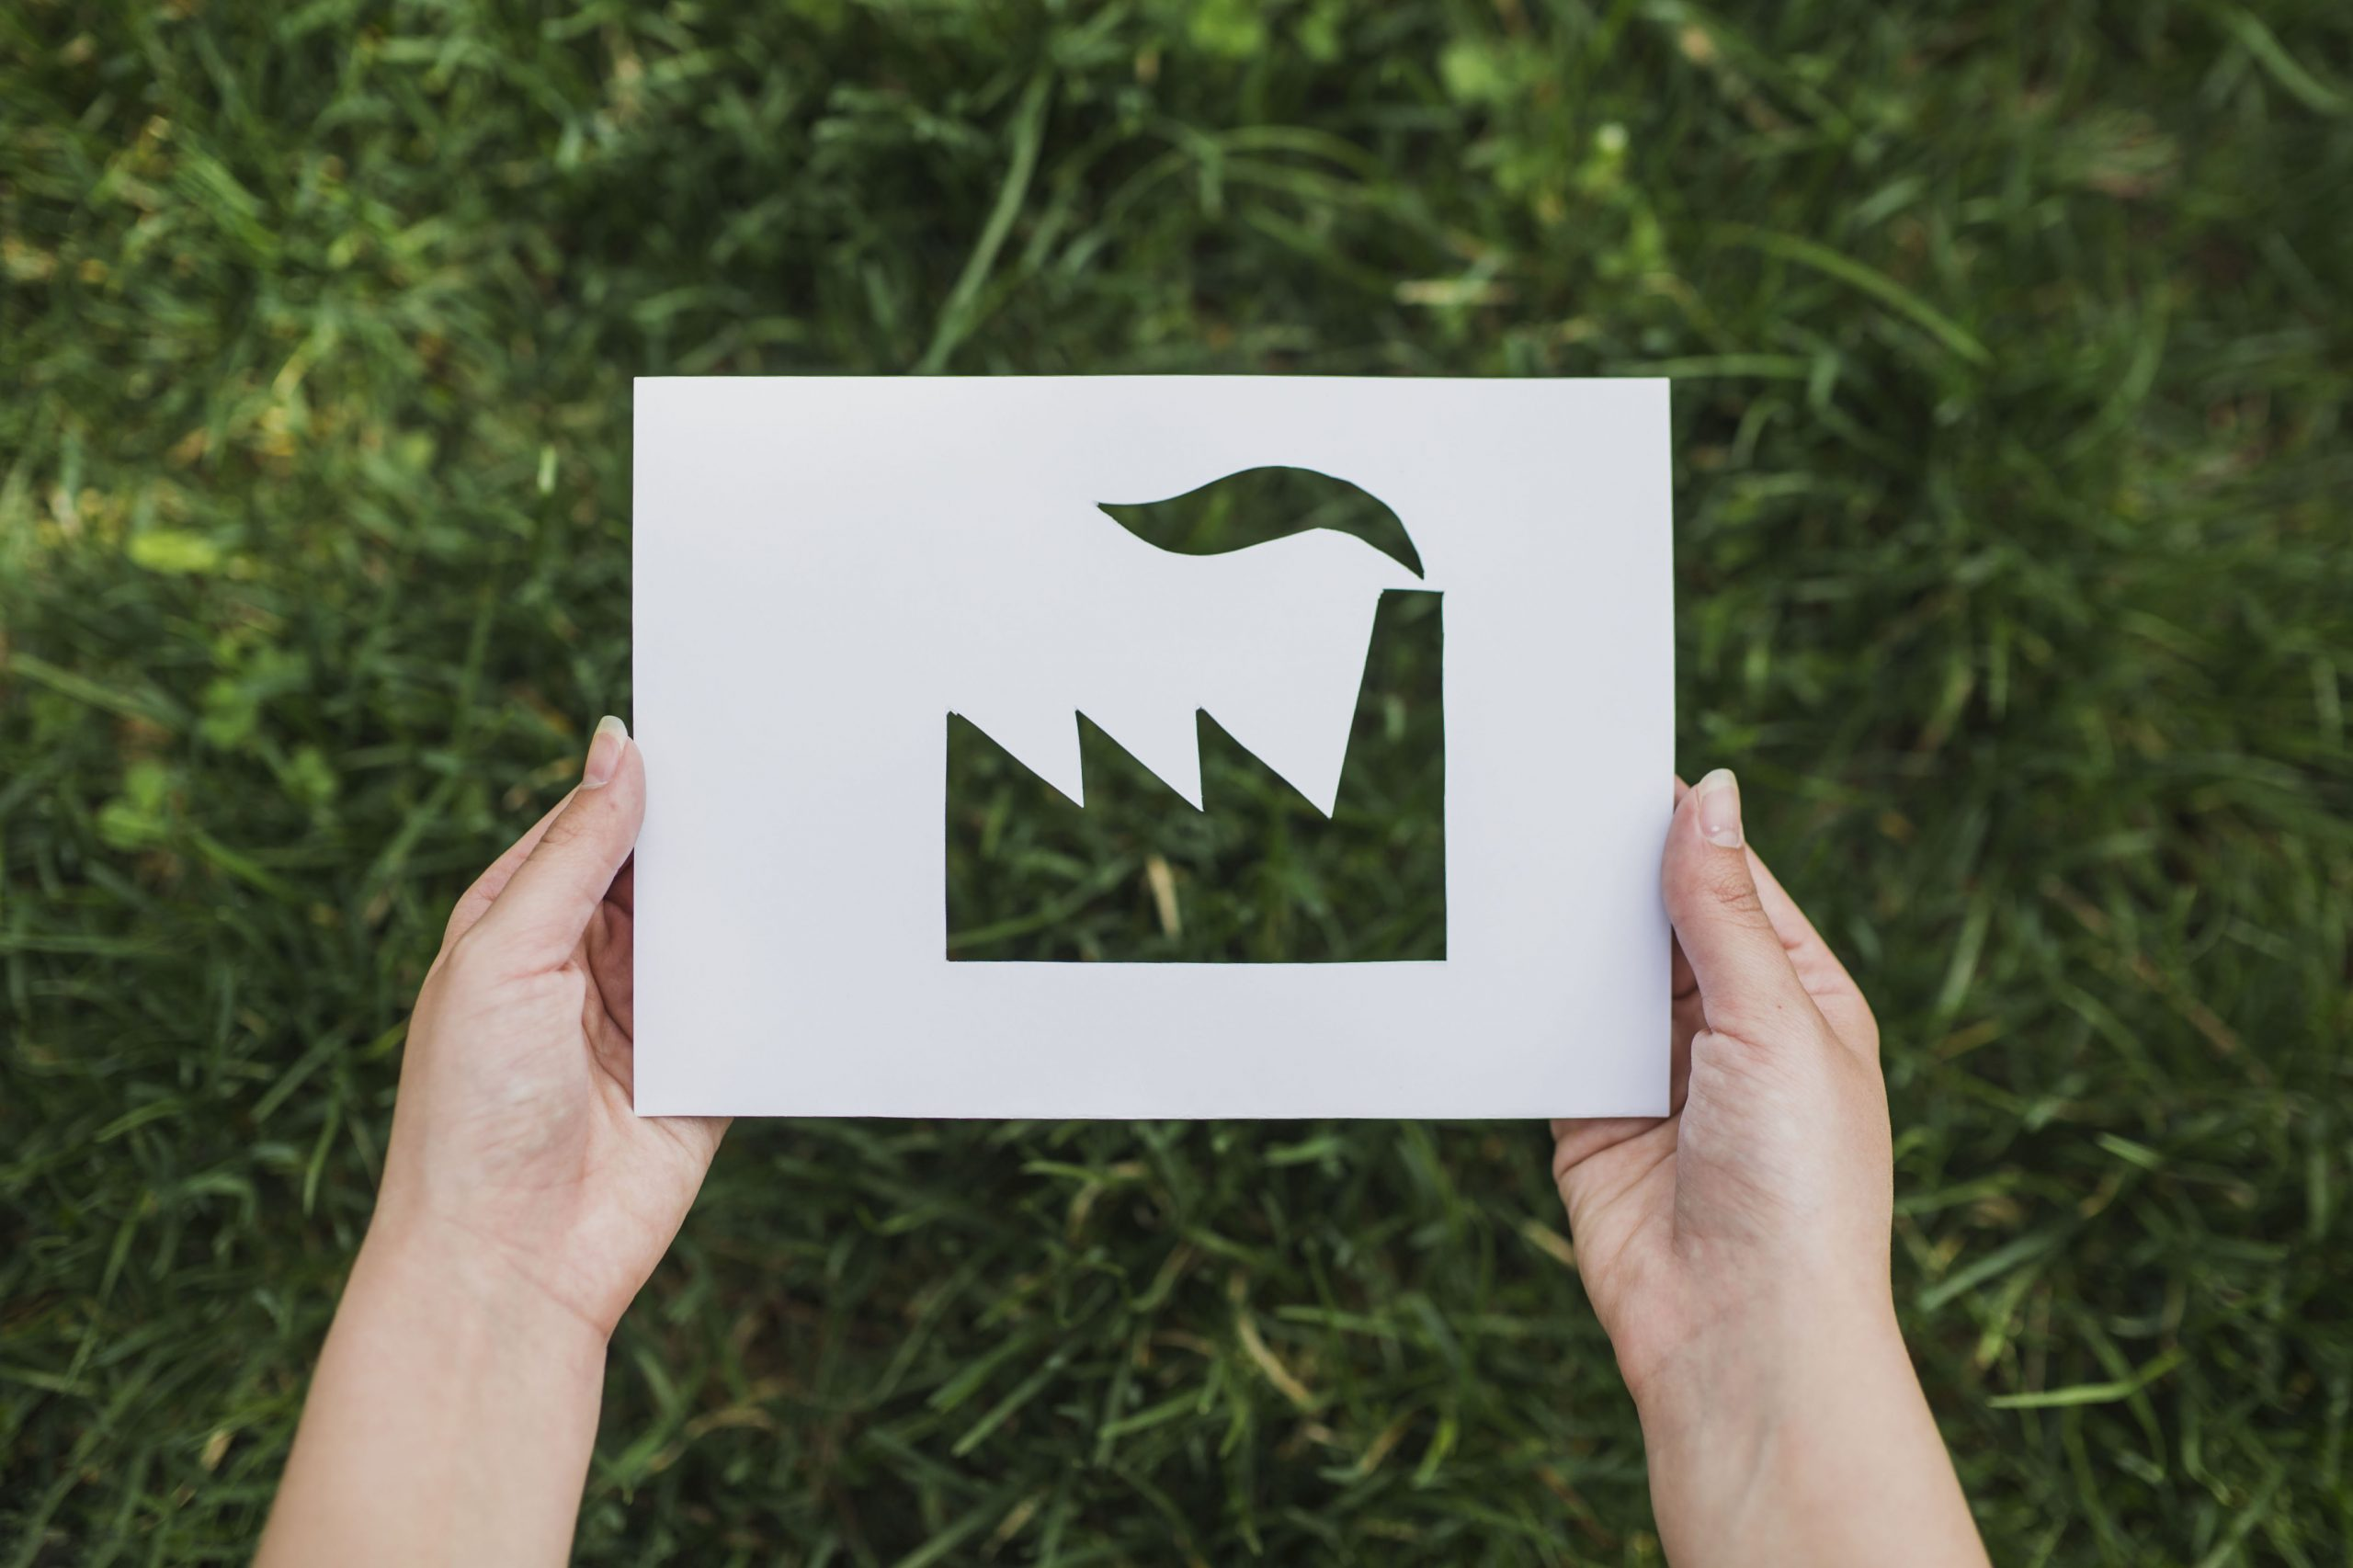 "Sublime recluta estuidantes para investigación con cal. Imagen:href=""http://www.freepik.com"">Designed by Freepik"